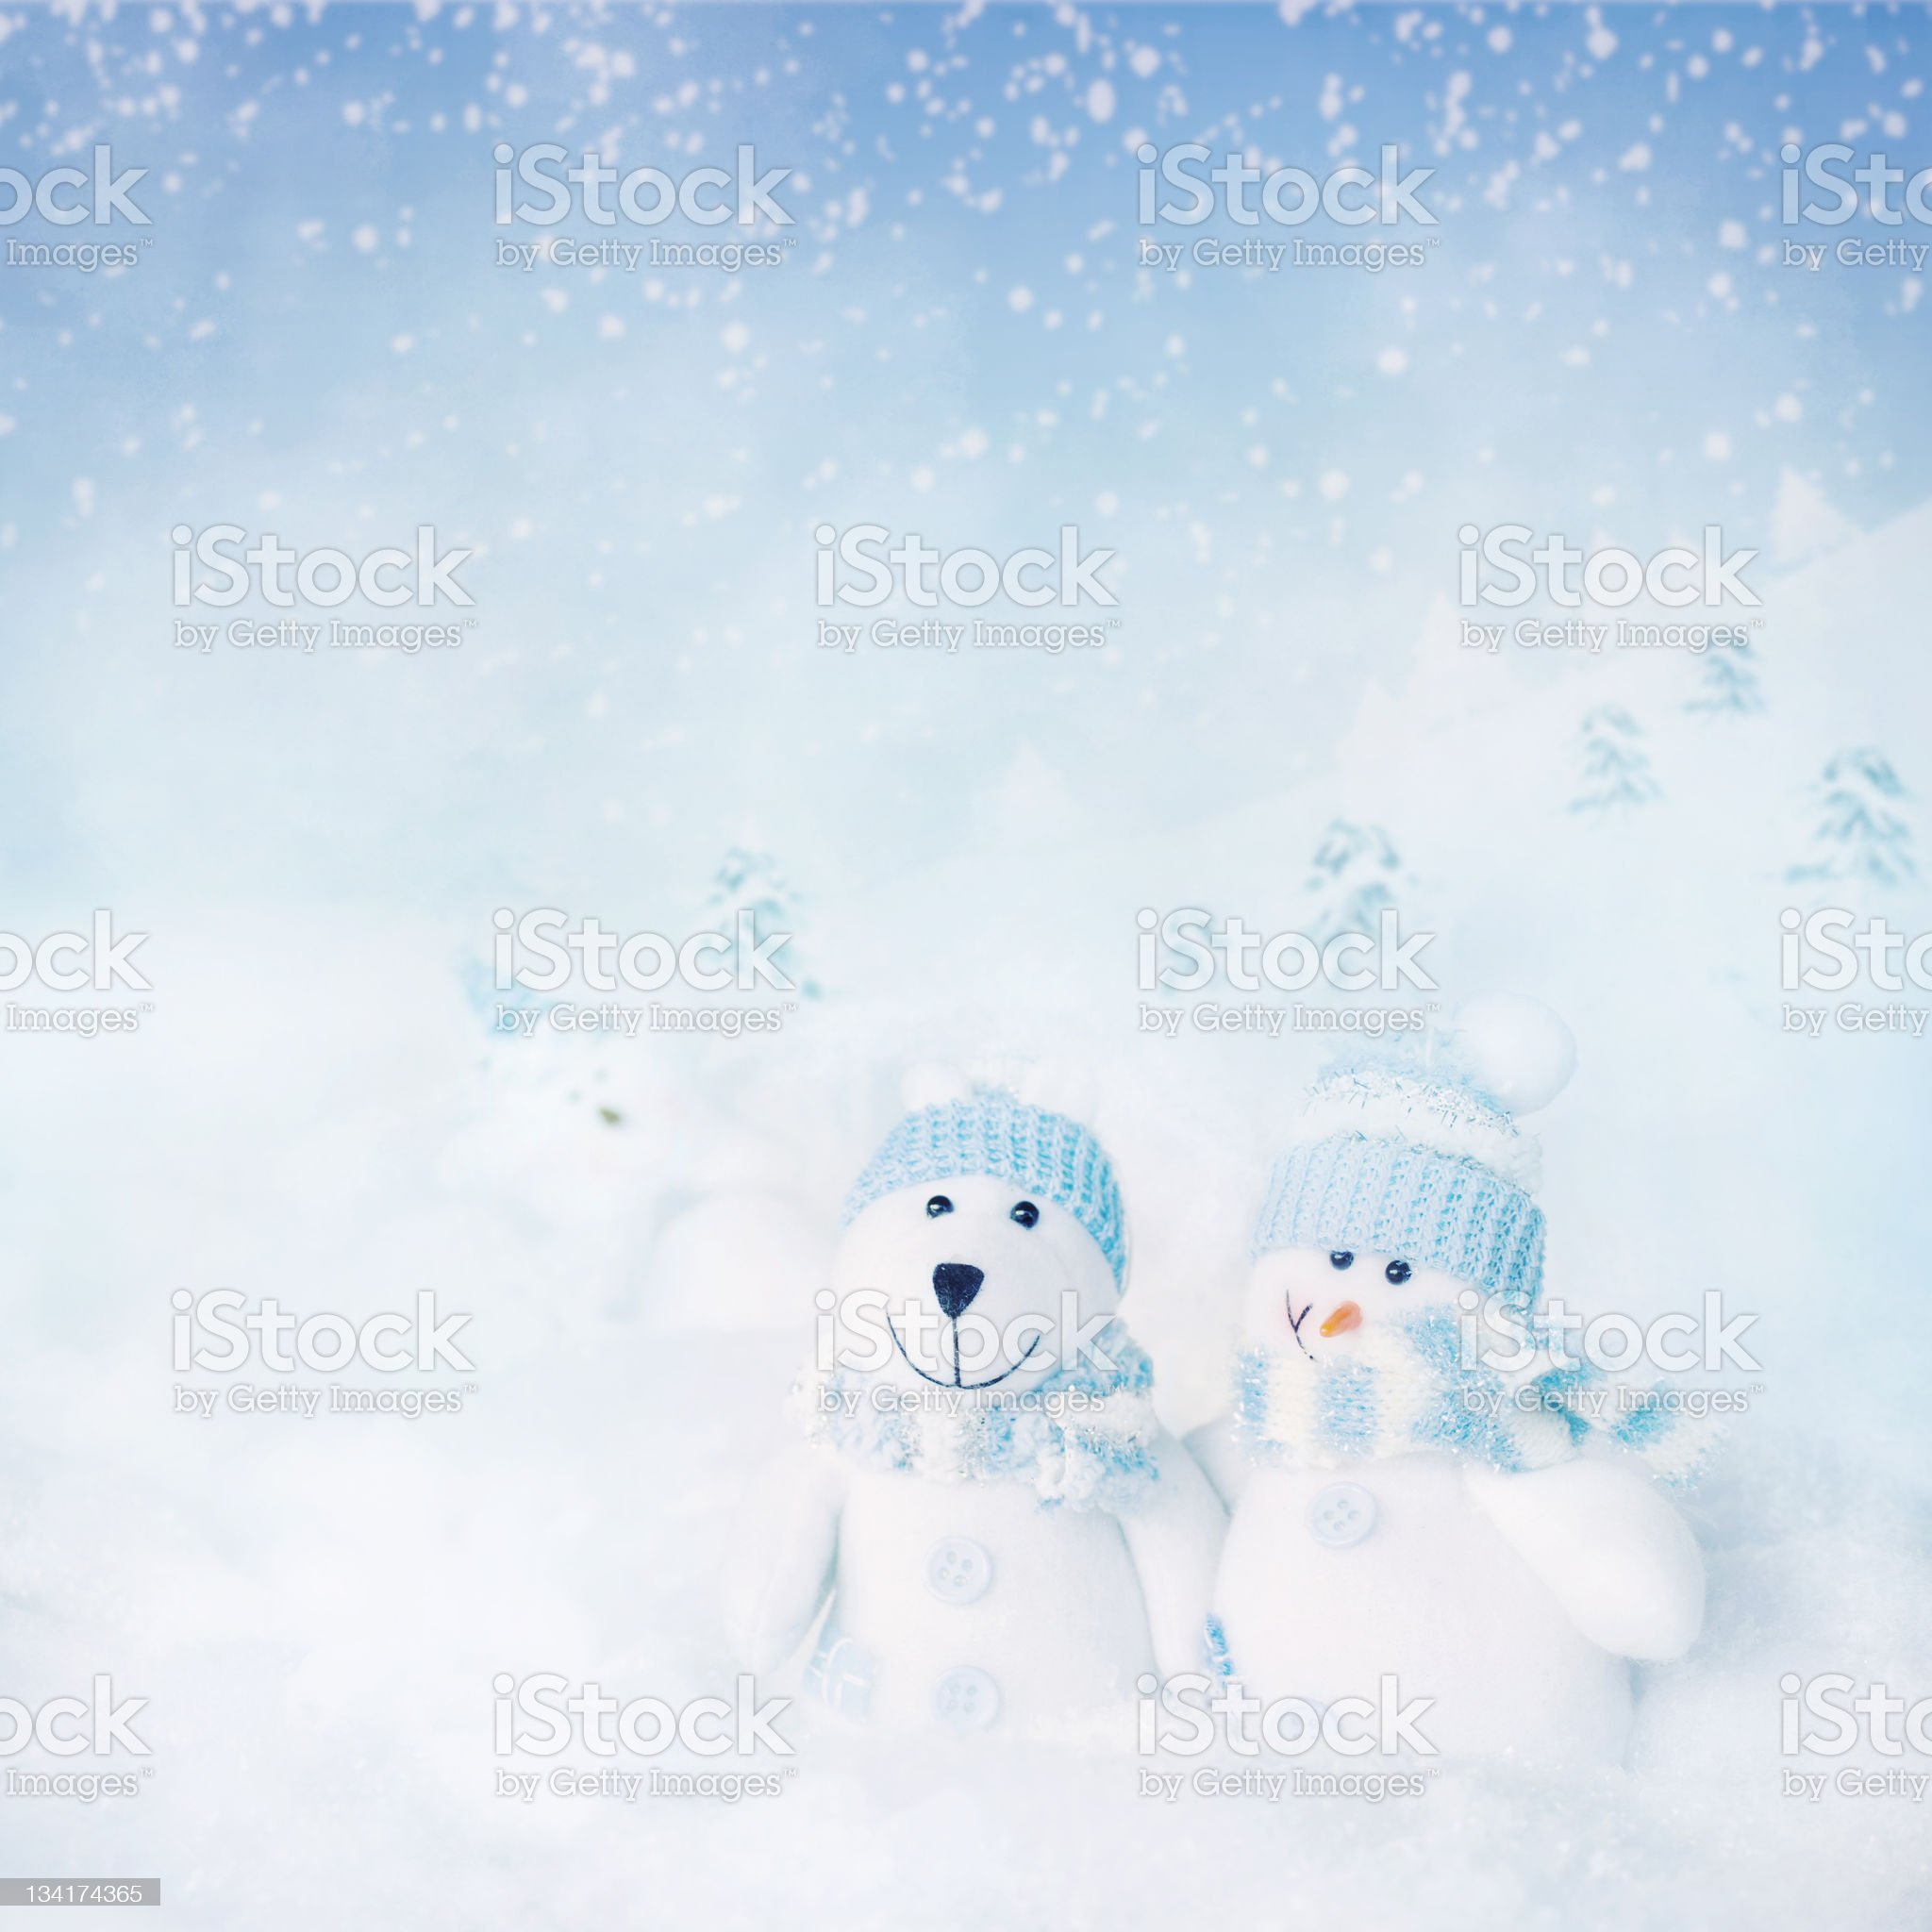 Christmas card. royalty-free stock photo